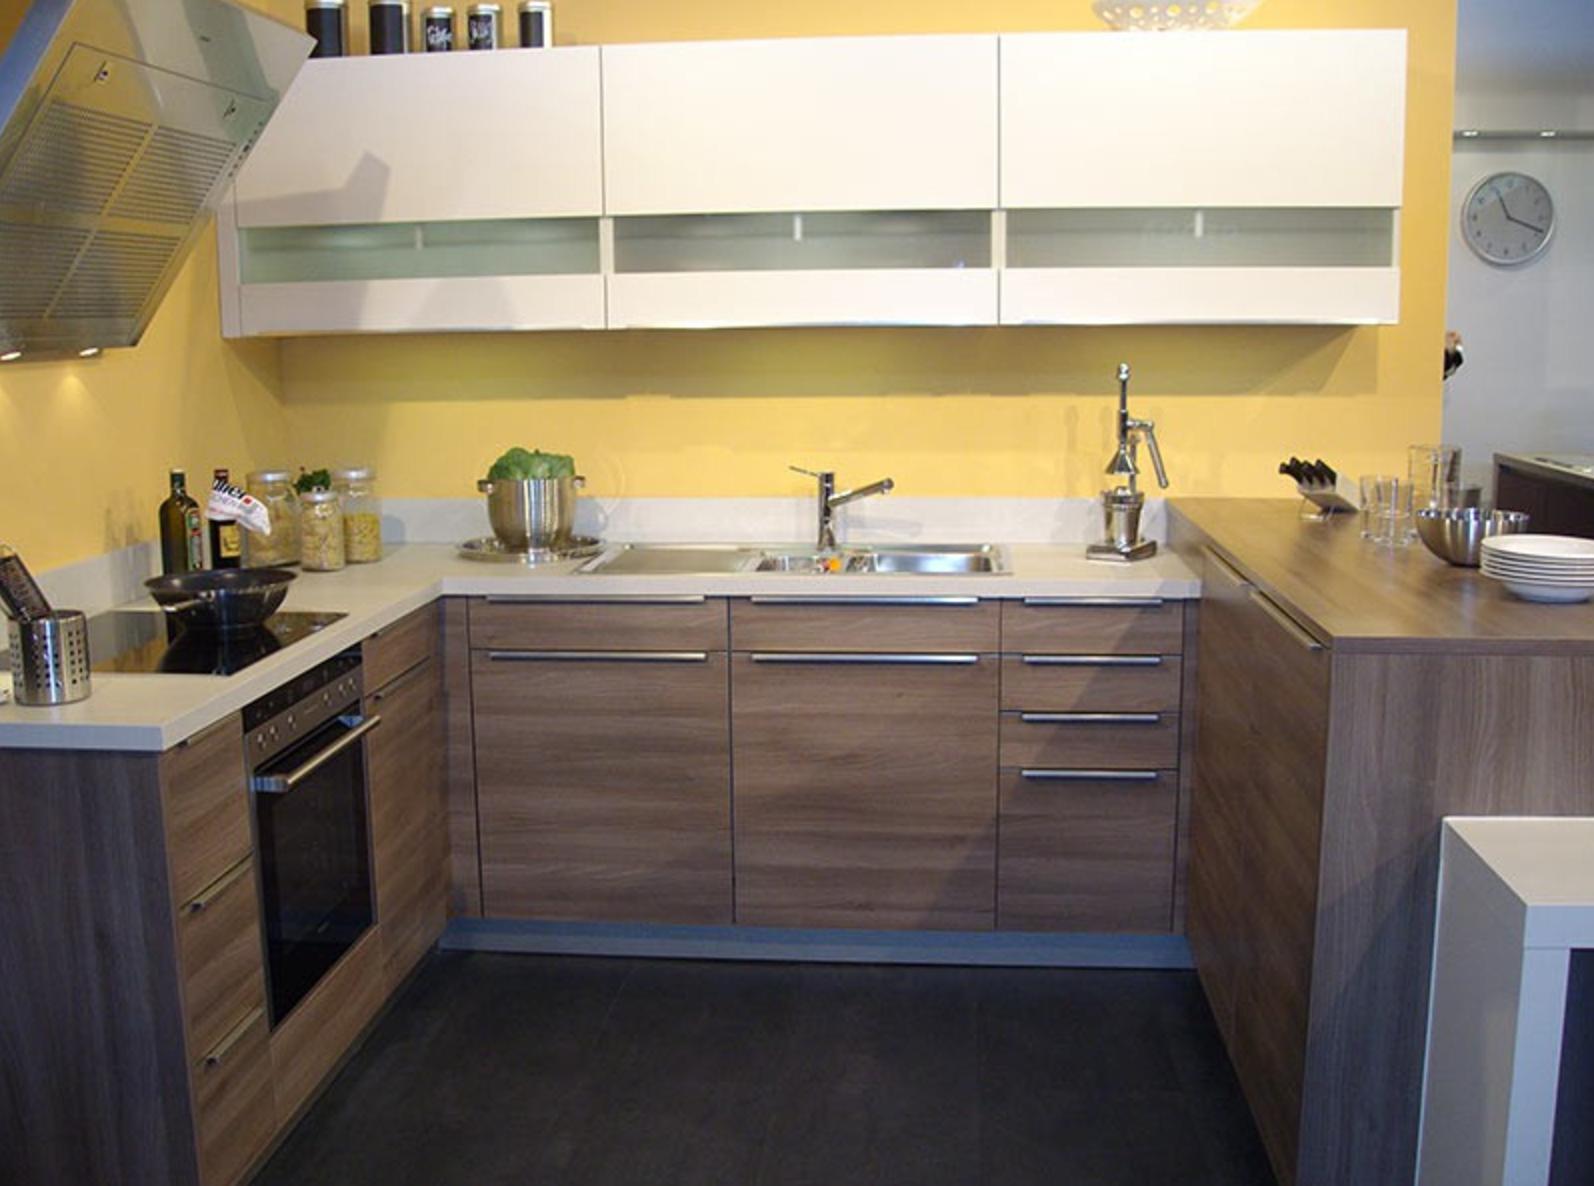 100 magasin salle bain geneve renovation salle bain for Aix cuisine du terroir montreal